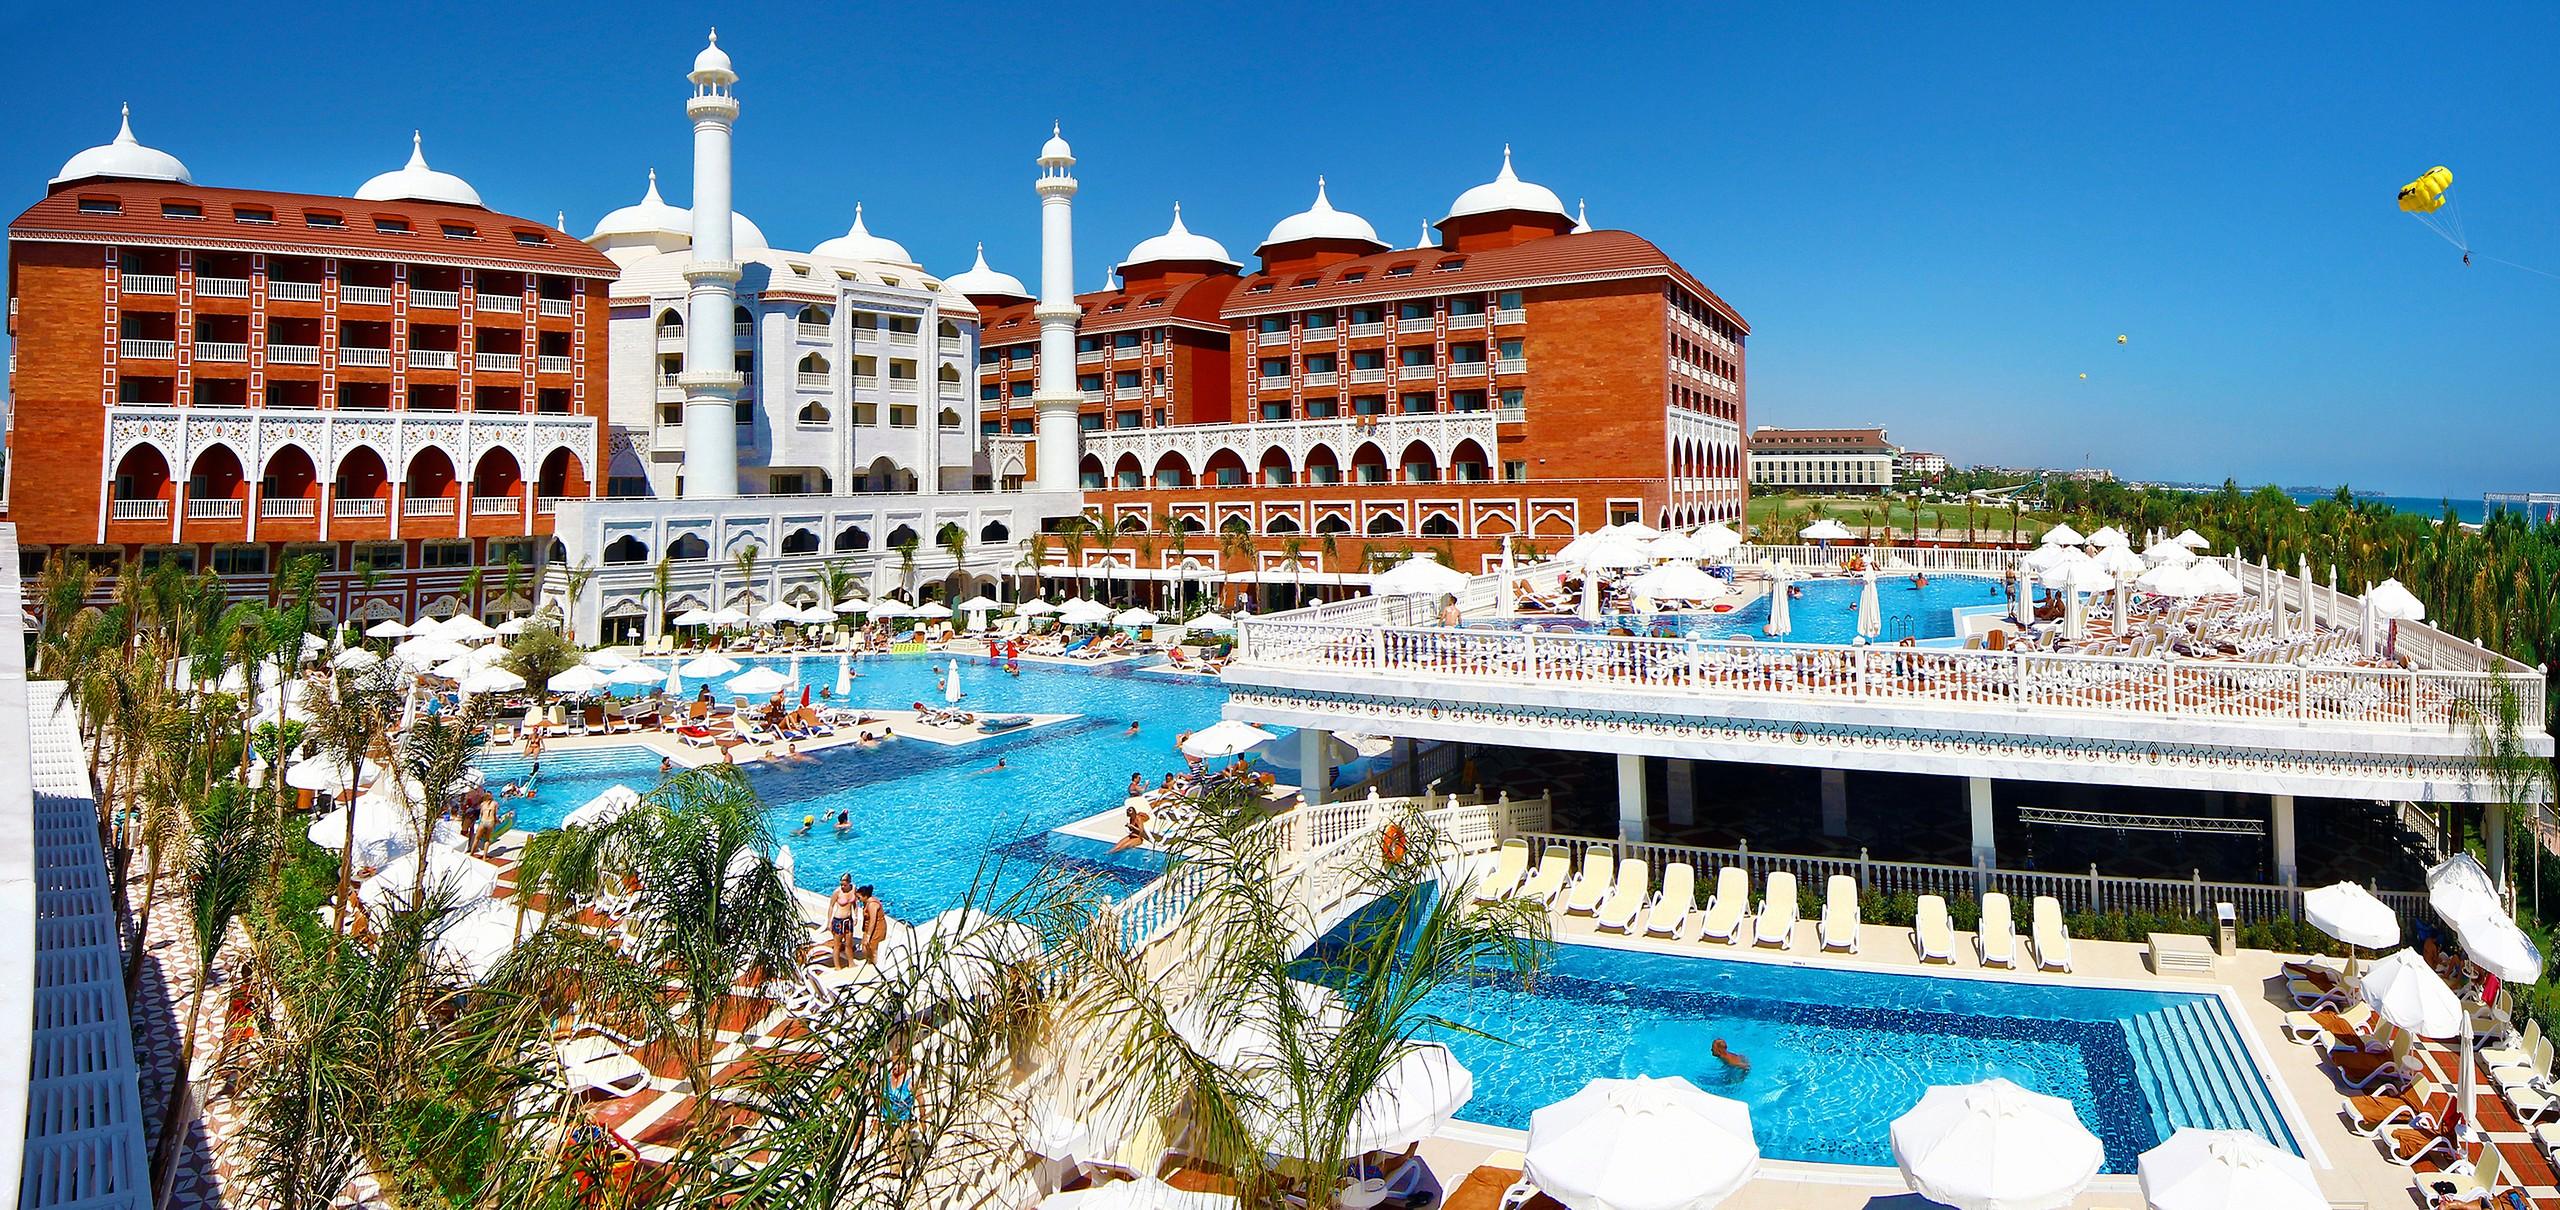 antalya side en iyi oteller royal taj mahal